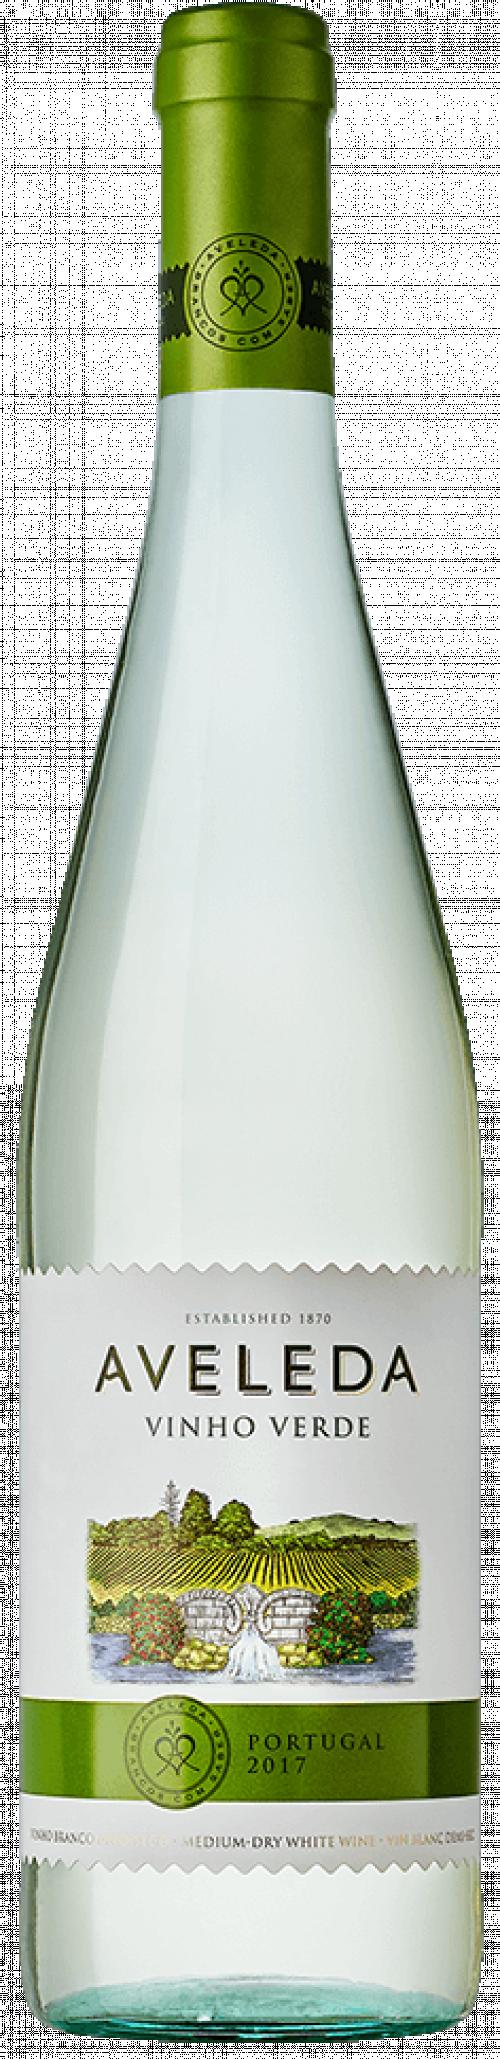 2019 Aveleda Vinho Verde 750ml